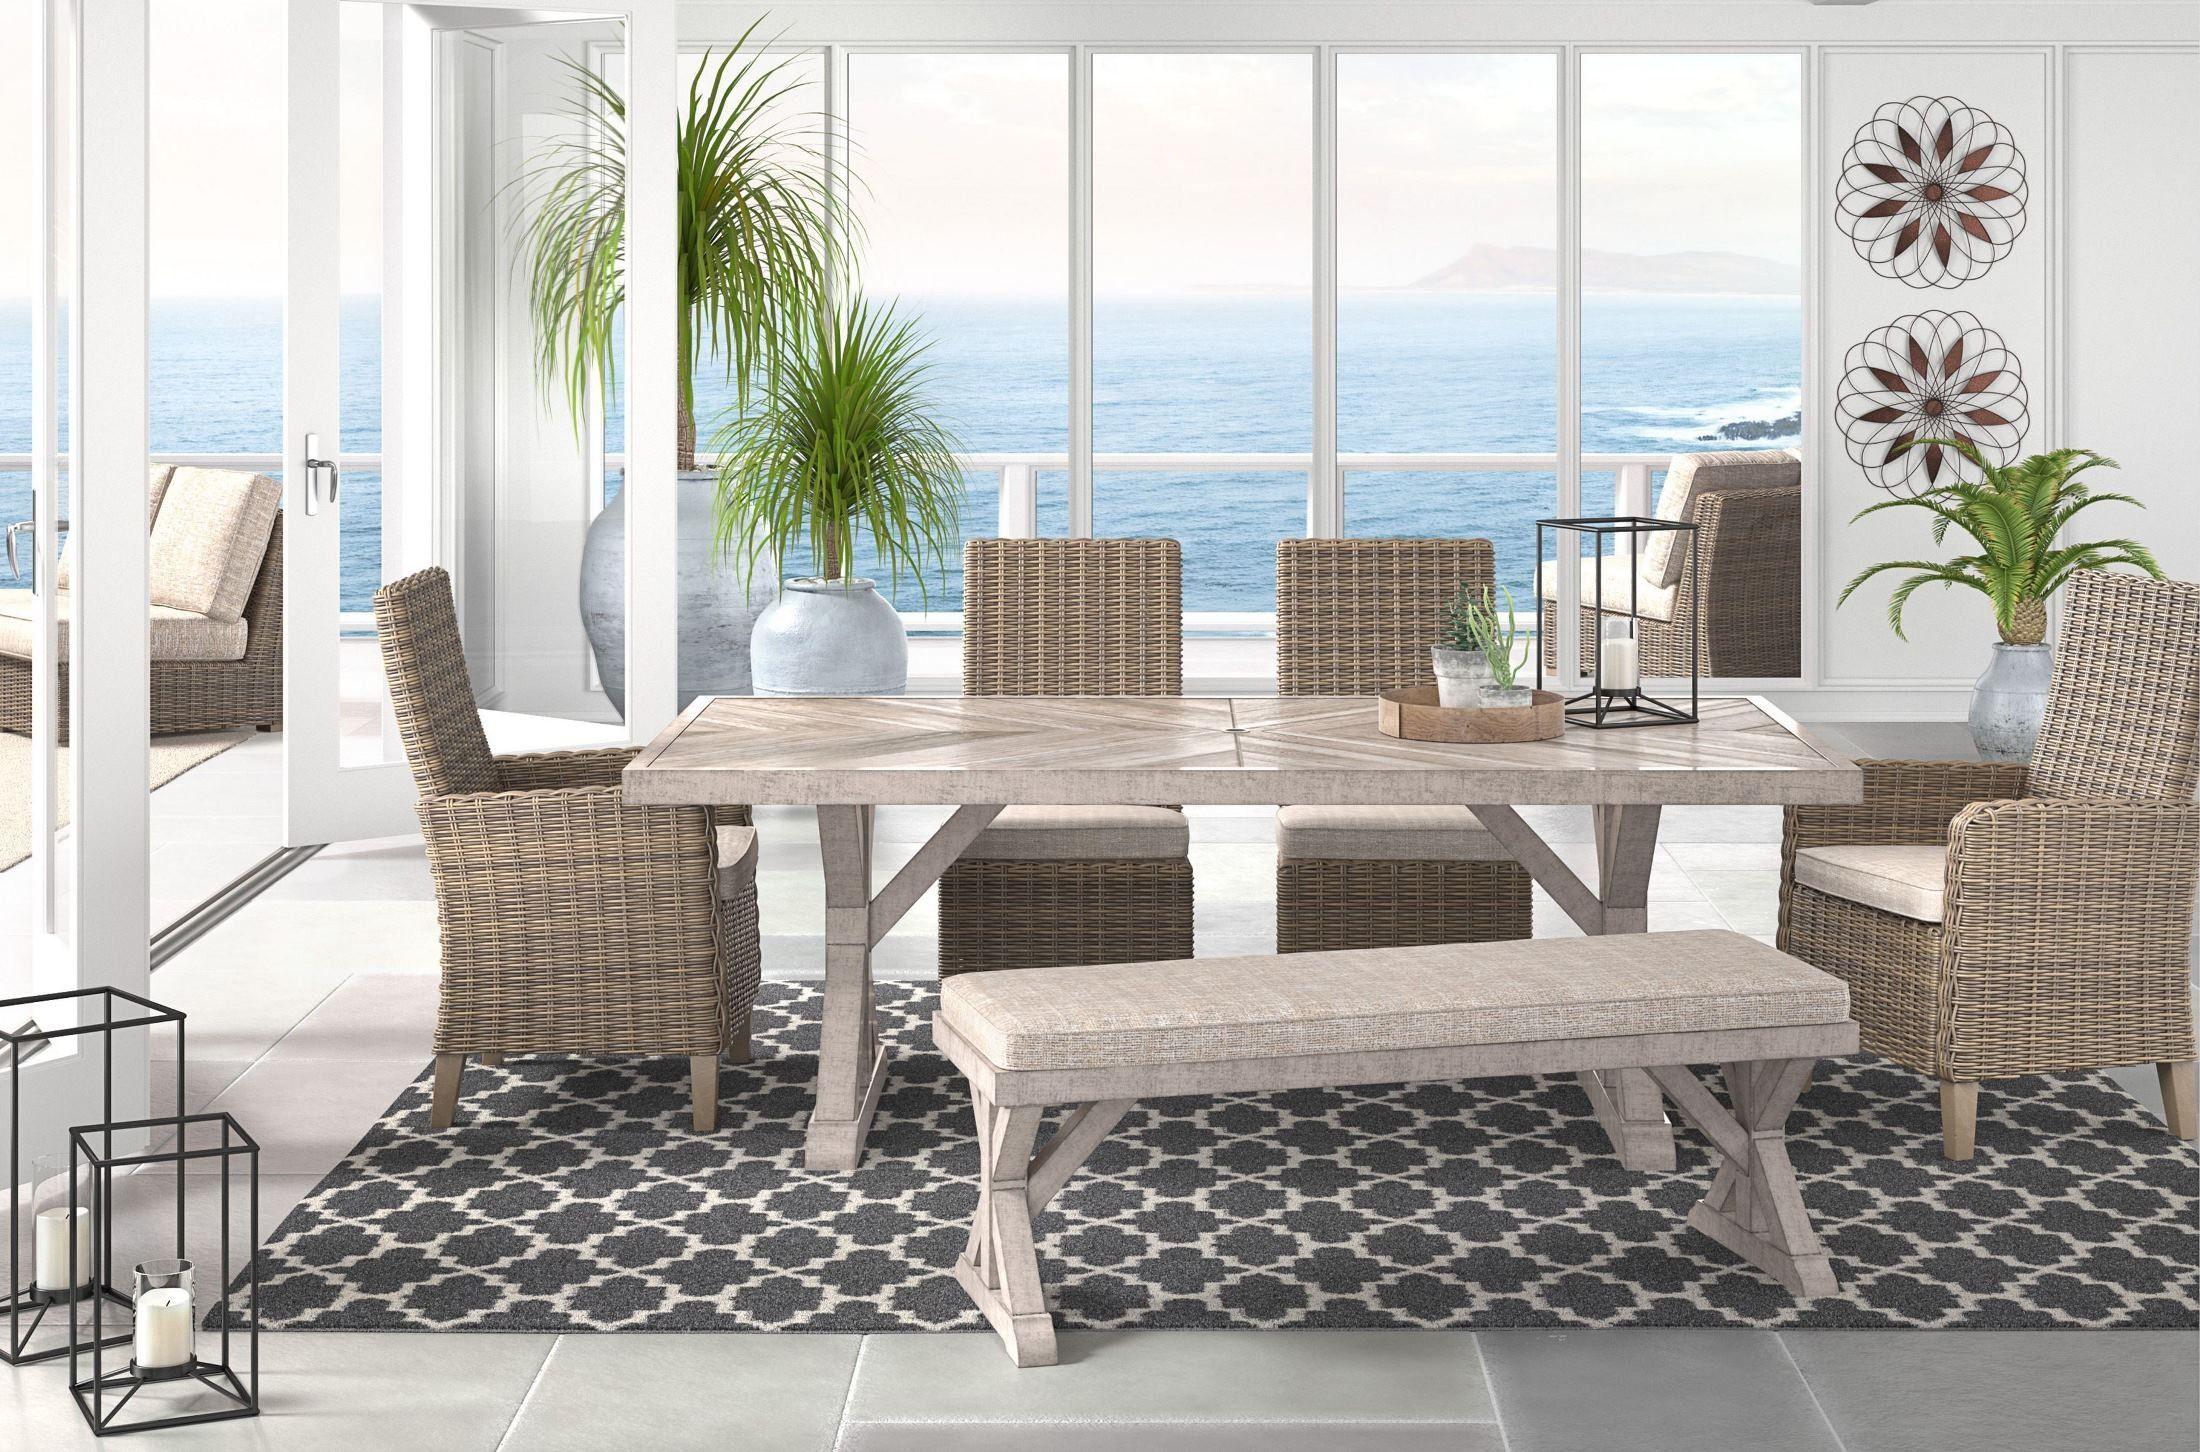 Beachcroft Beige Rectangular Dining Table   Buy outdoor ... on Beachcroft Beige Outdoor Living Room Set id=44720